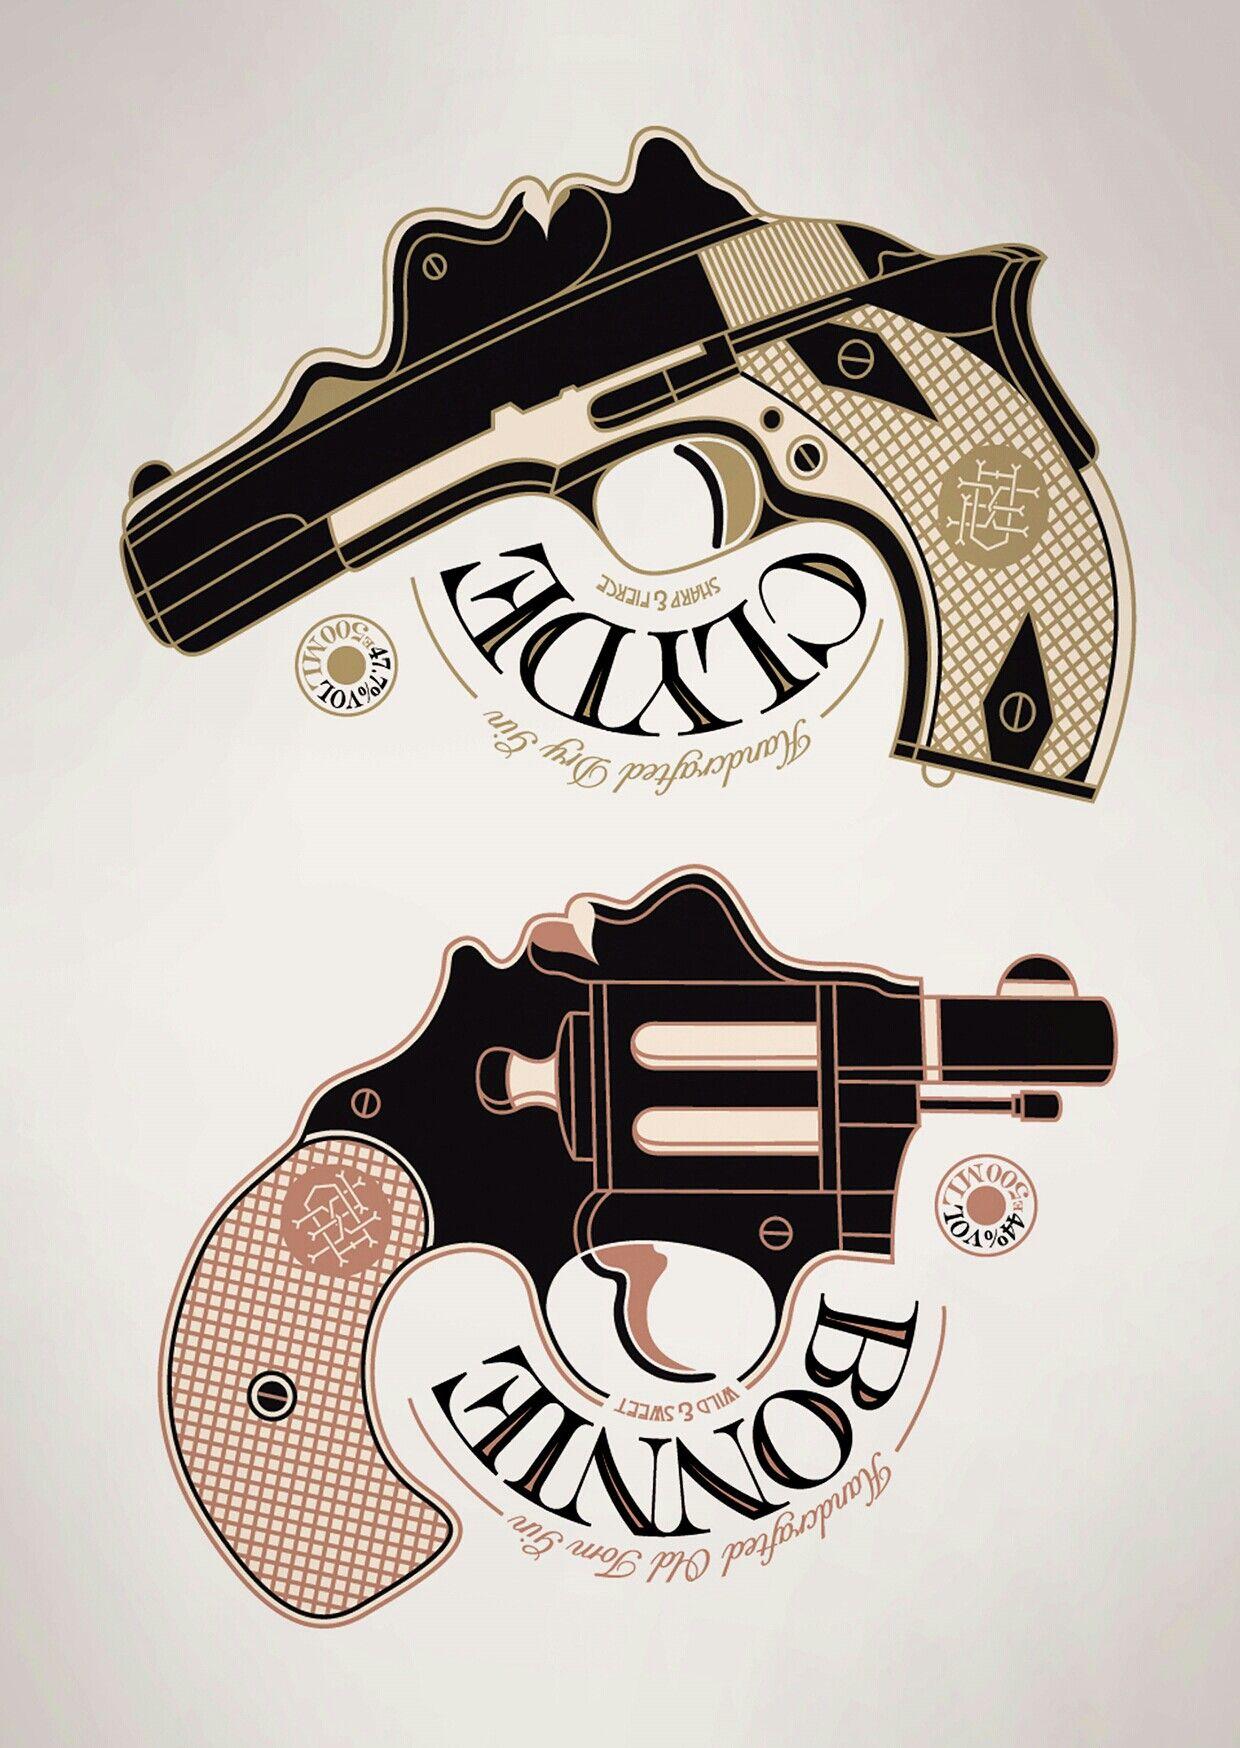 Bonnie and Clyde guns fetch $0 5m | Articles of Interest | Bonnie